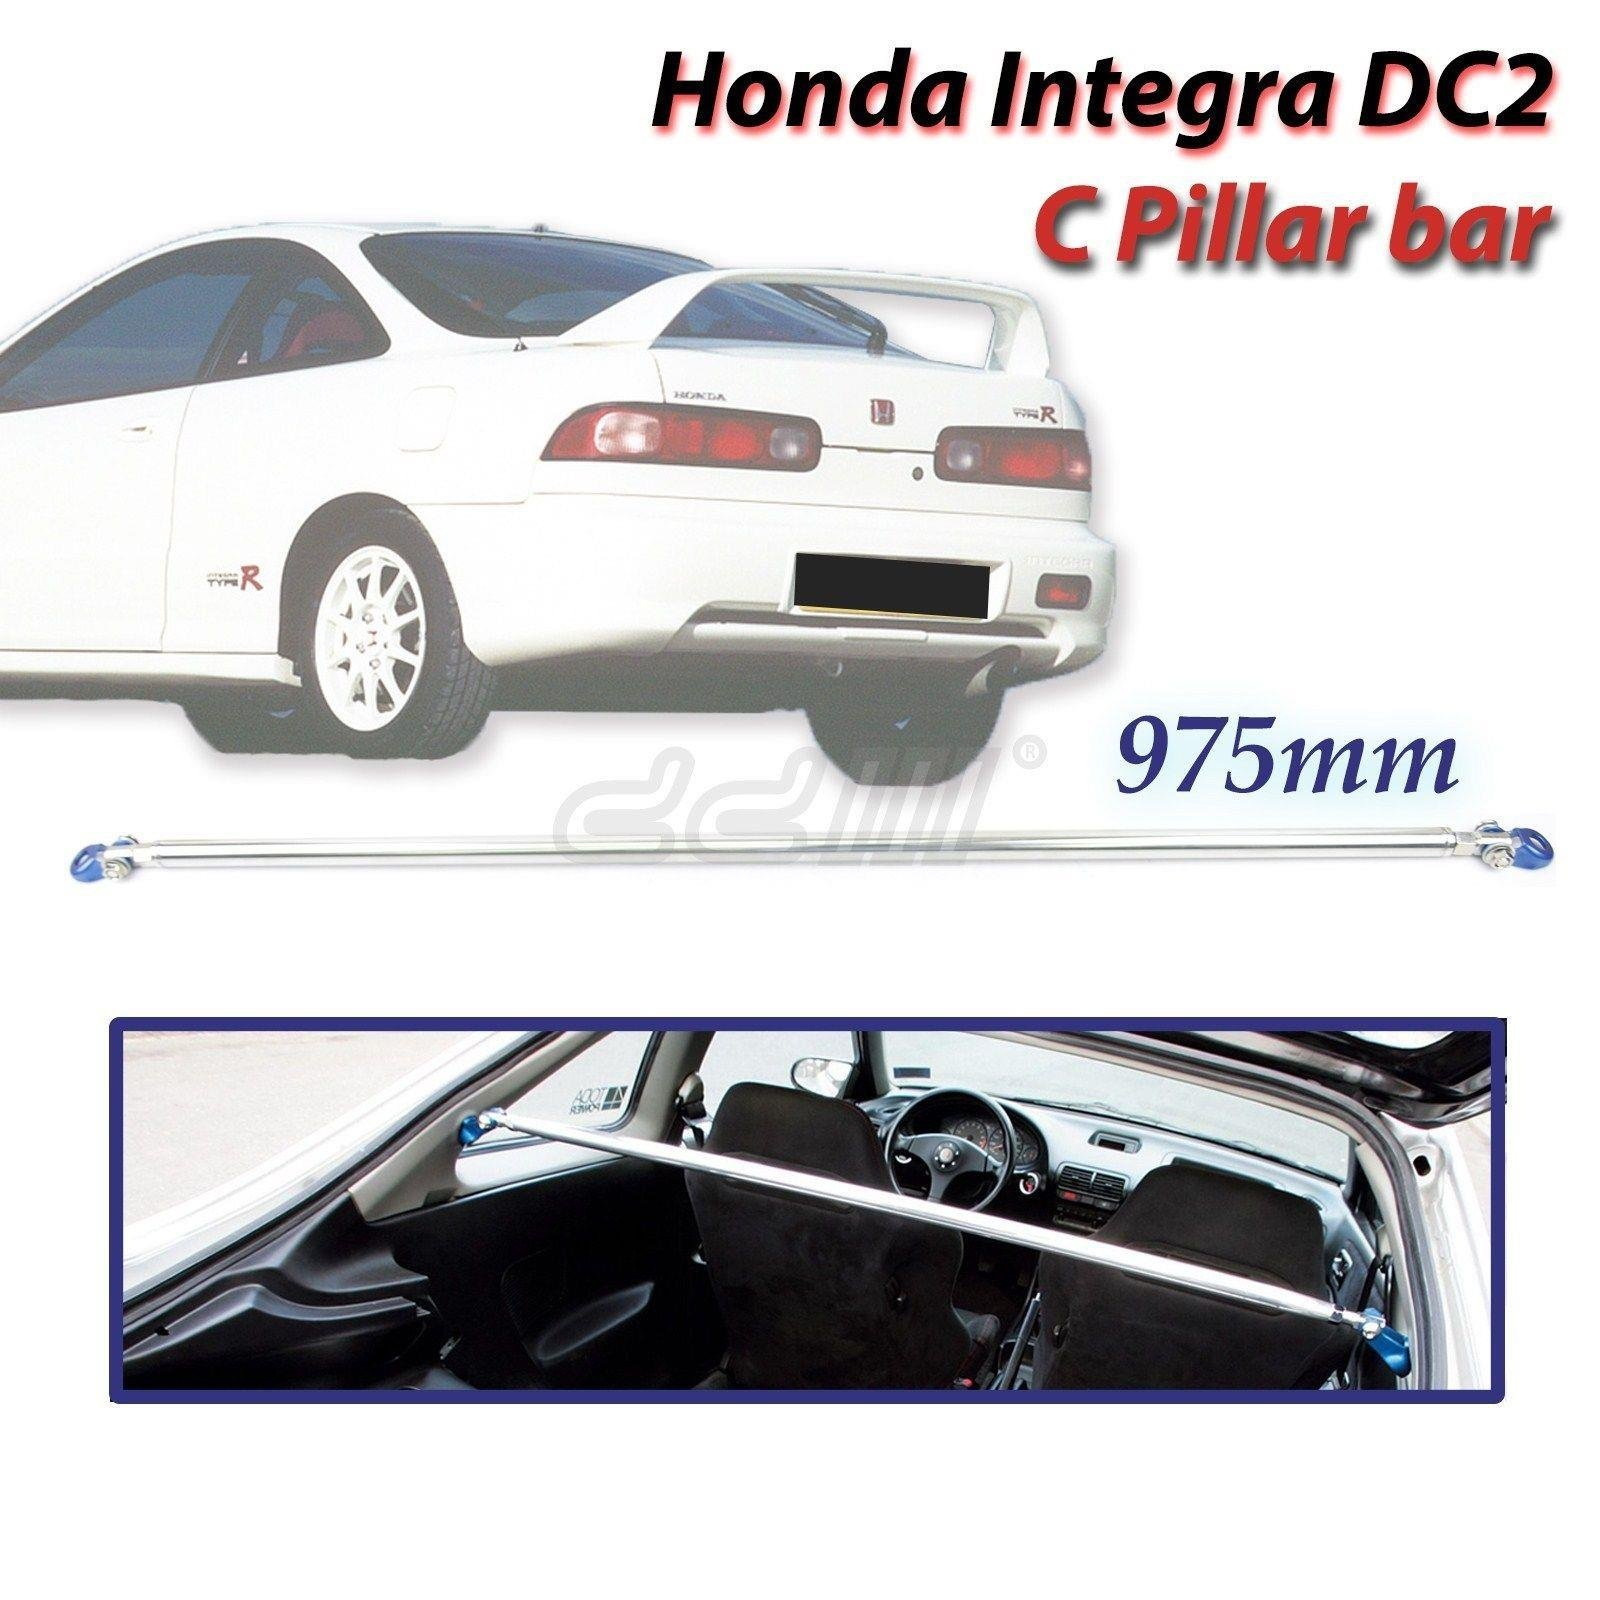 JDM Racing Rear C Pillar Upper Brace Bar 975mm Fits Honda Integra DC2 2-DOOR 94-01